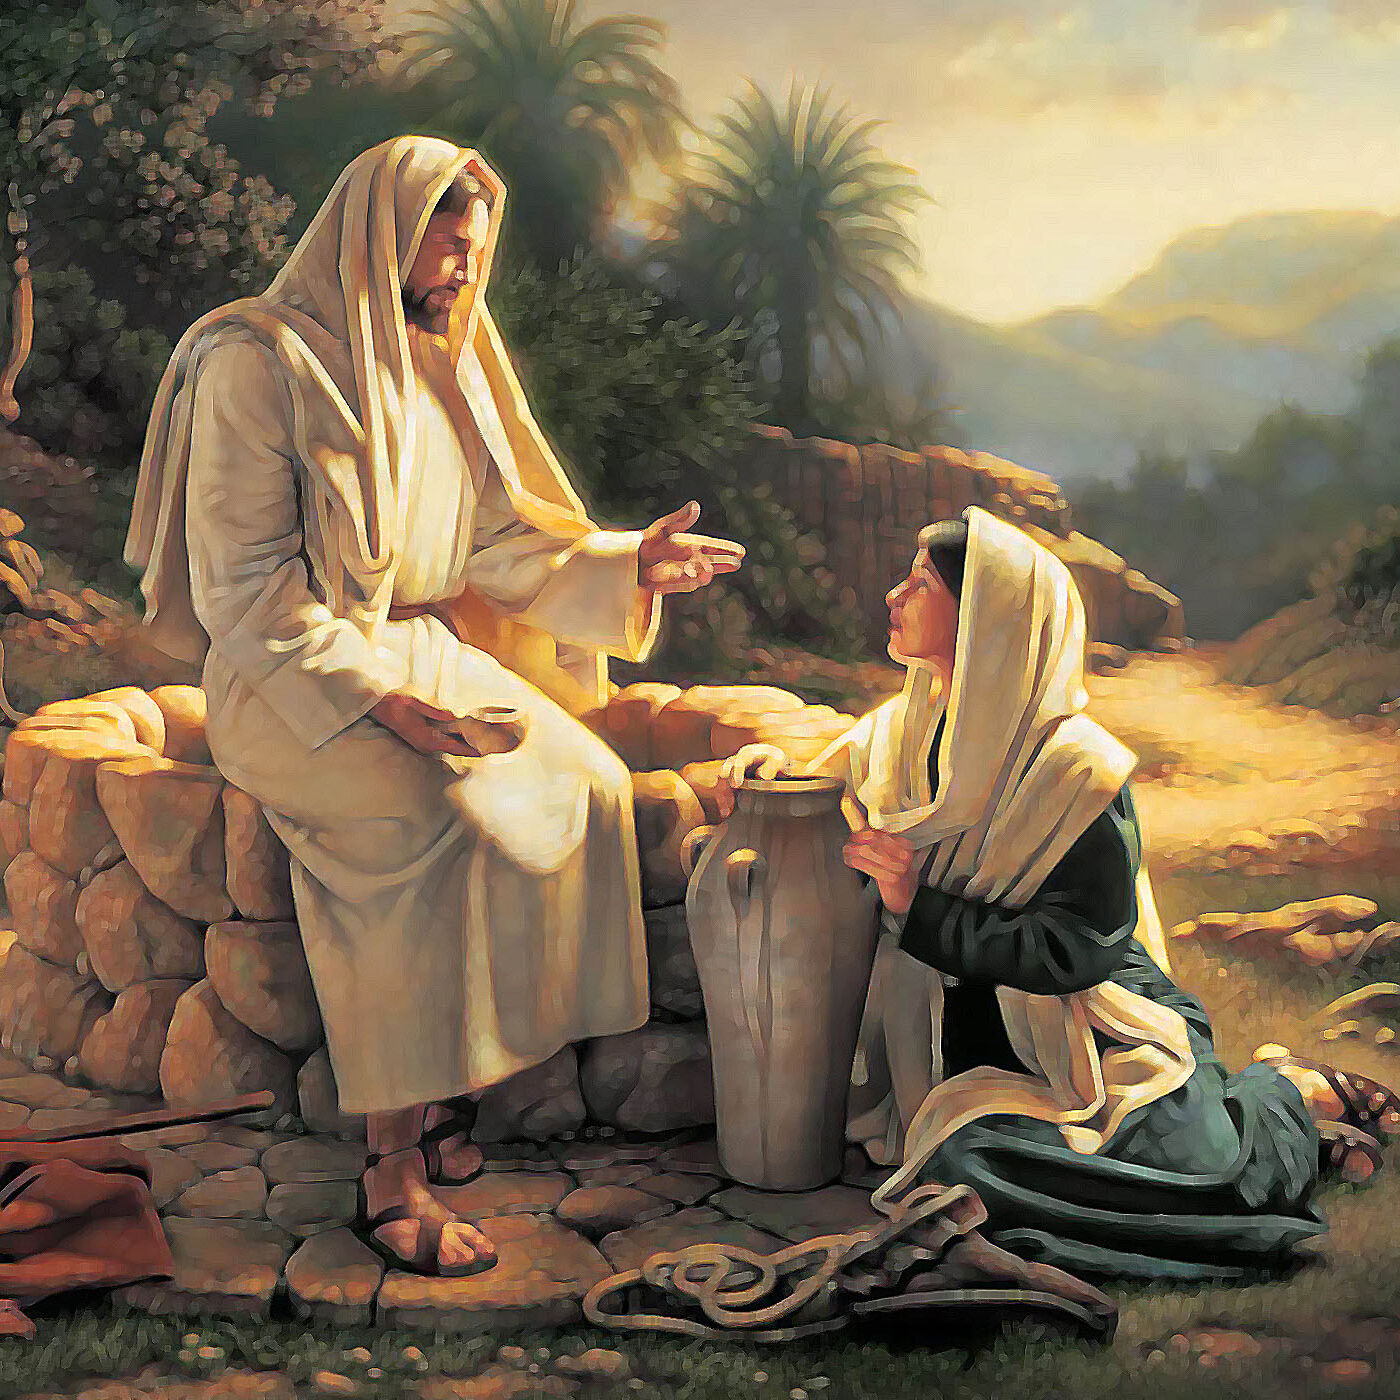 riflessioni sul Vangelo di Mercoledì 21 Aprile 2021 (Gv 6, 35-40)